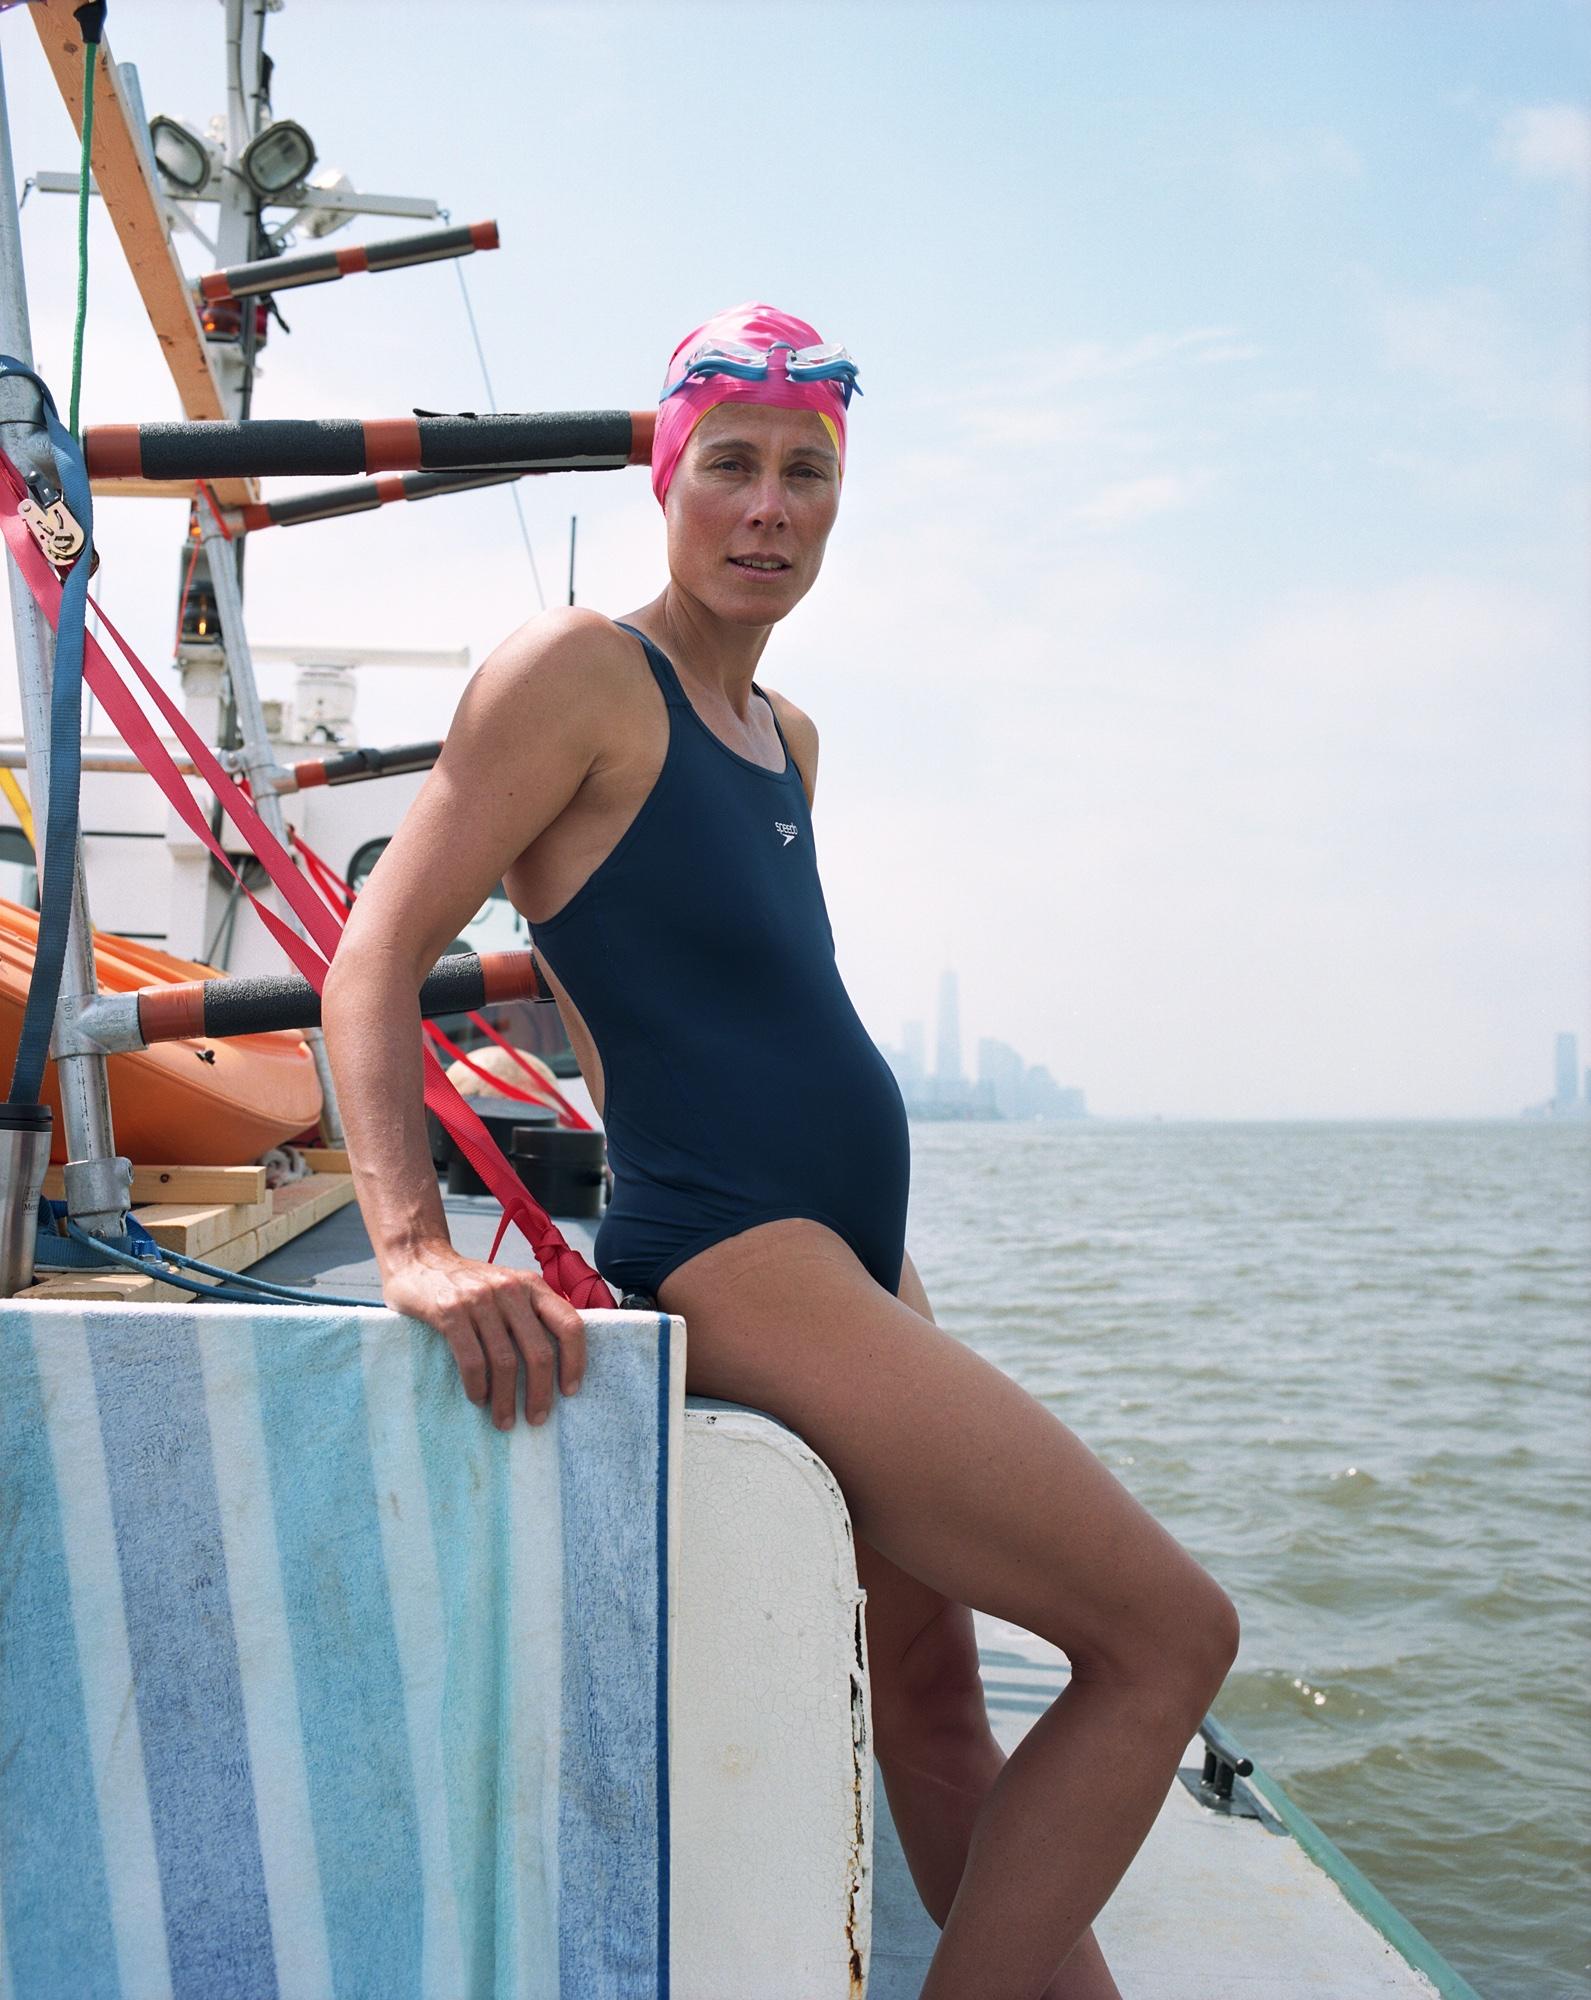 Rondi, 8 Bridges Swim Organizer, The Hudson River